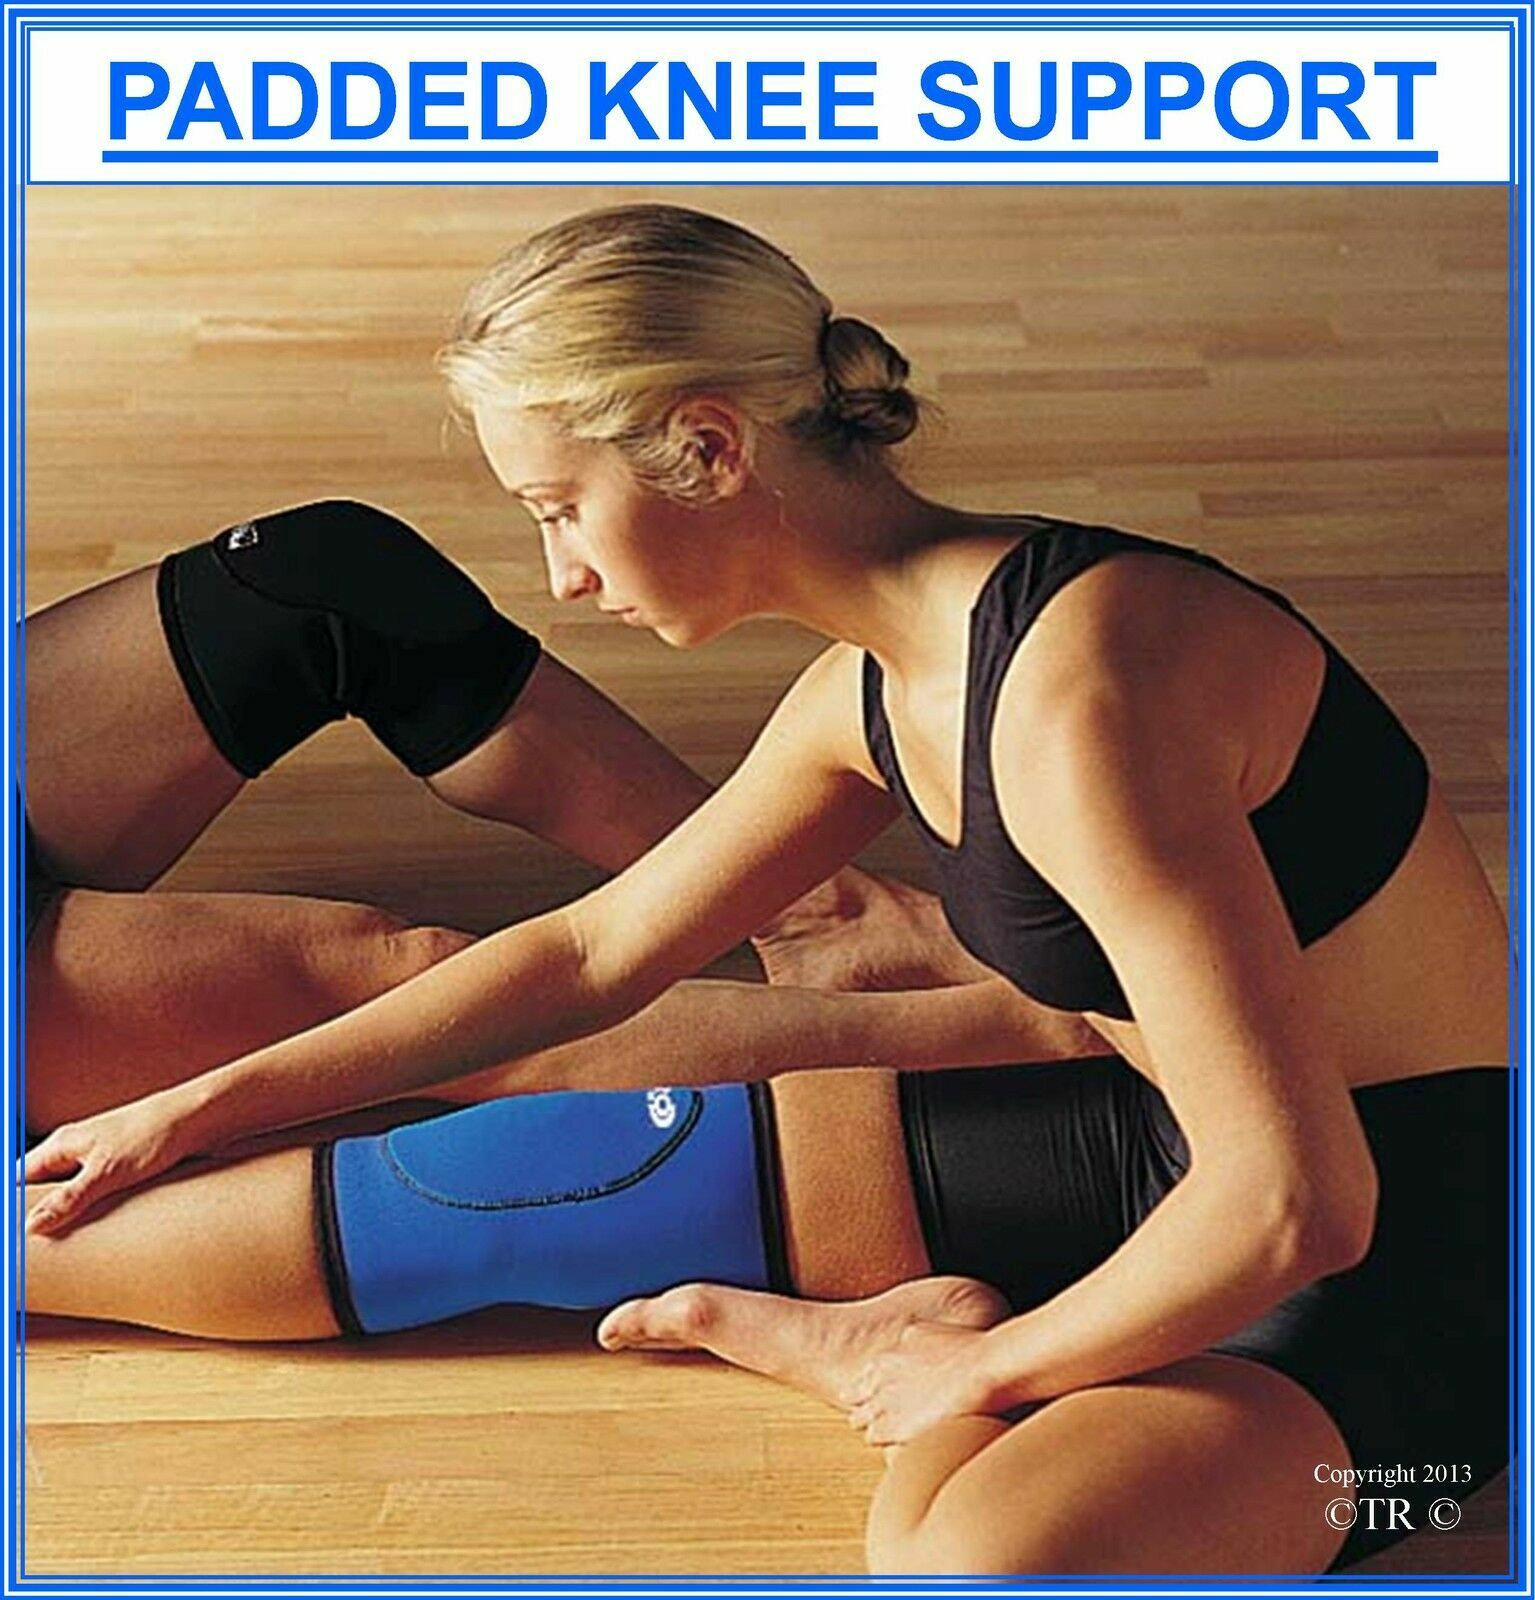 Clearance Proline Padded Knee Support Neoprene Sport Legs Protective Gear Sleeve